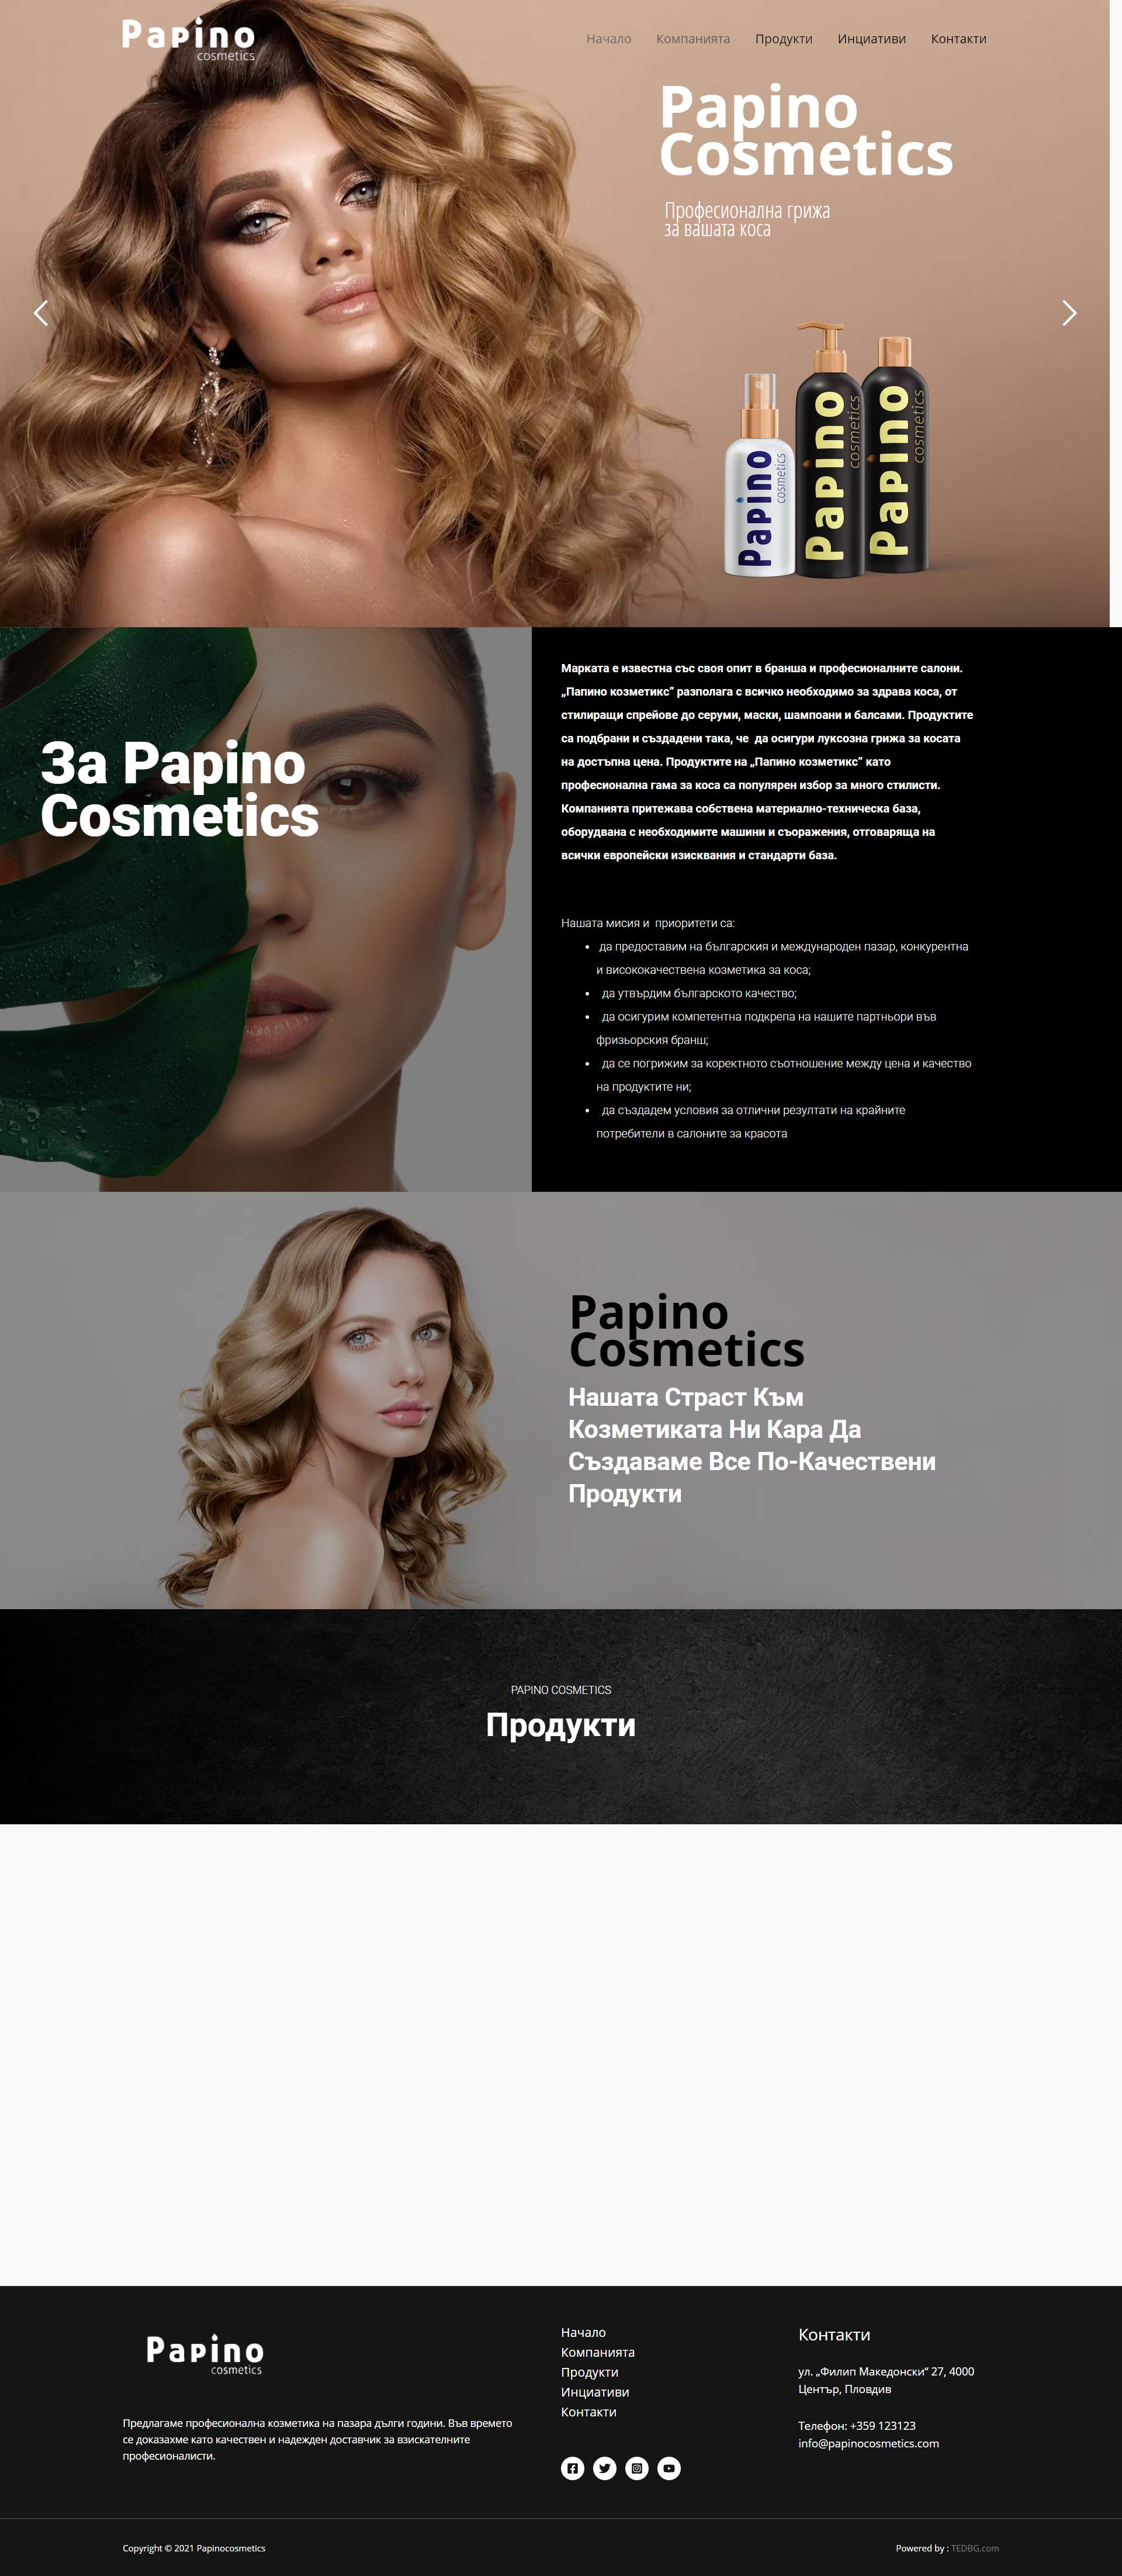 Papinocosmetics - papinocosmetics.com